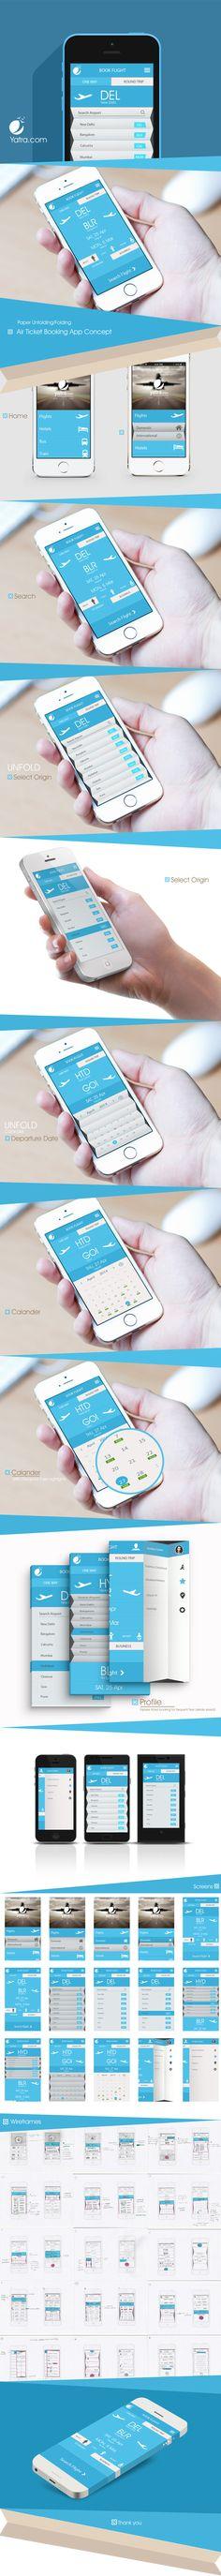 Air ticket booking App UX/UI Concept by Sansar Verma, via Behance